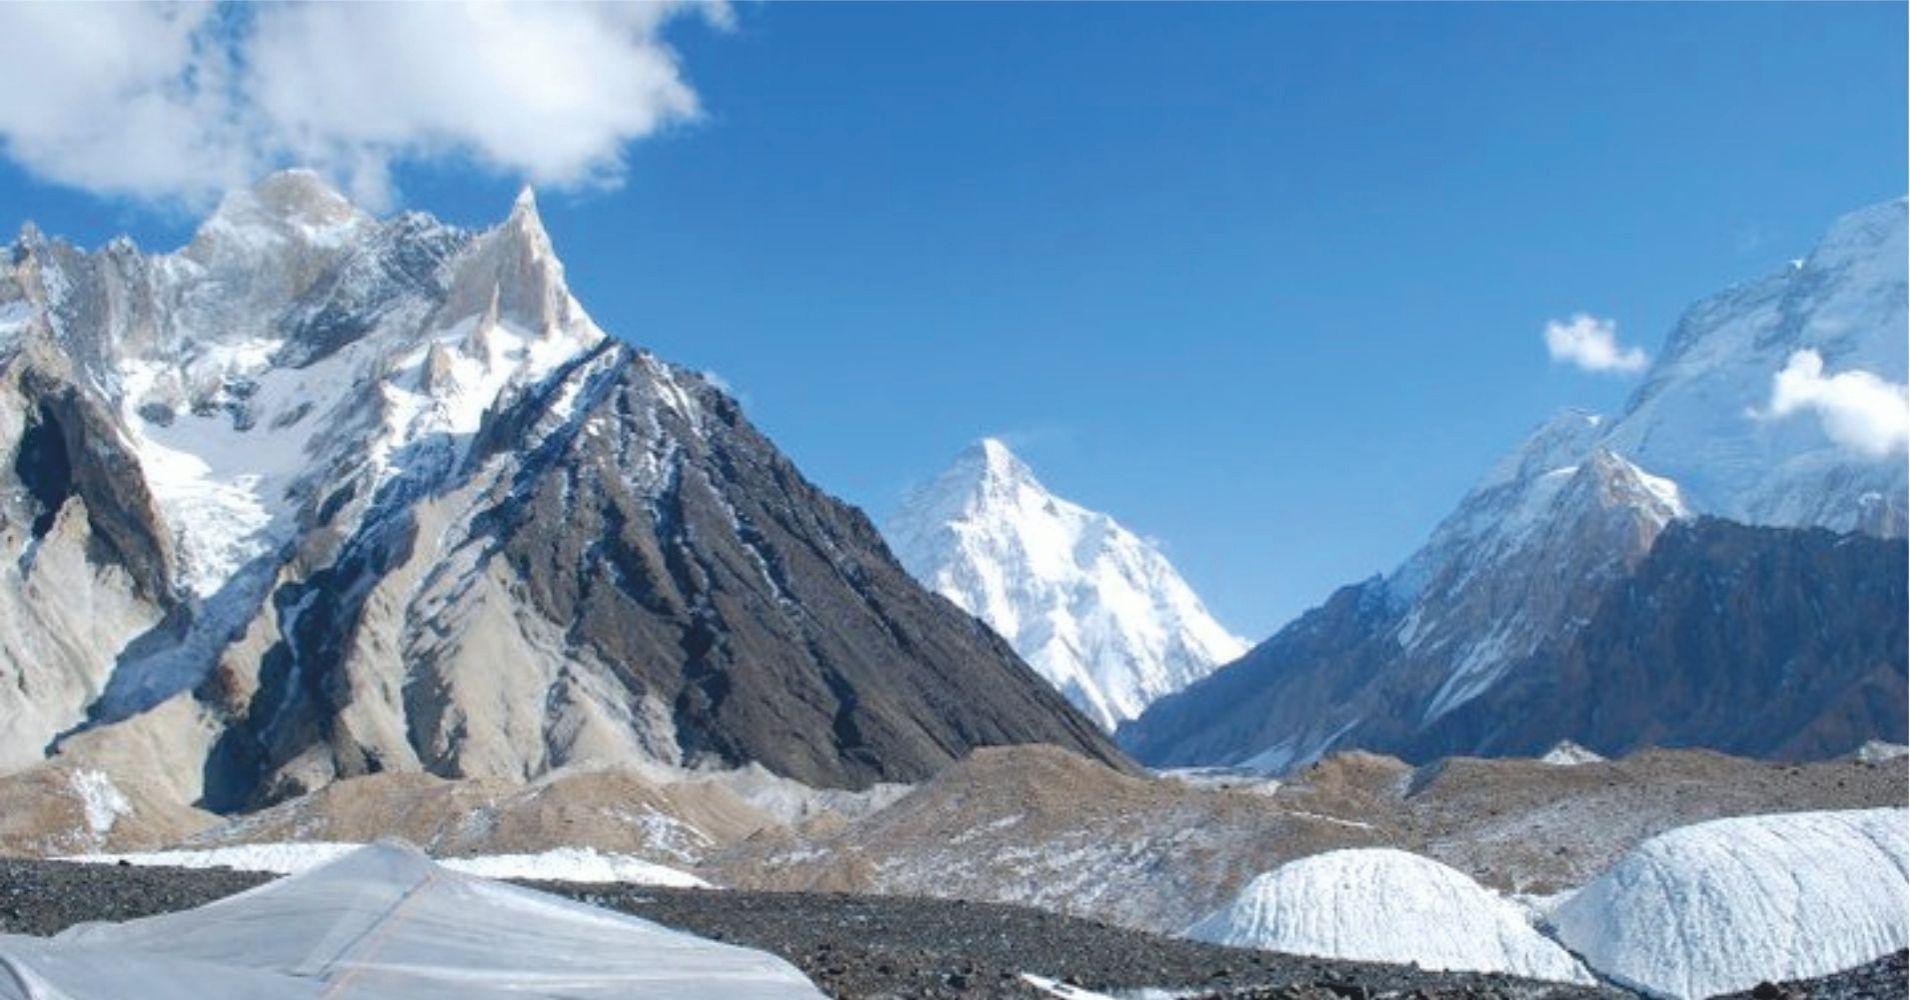 Glaciar Baltoro y Pico del K2 Rey del Karakorum. Pakistán.